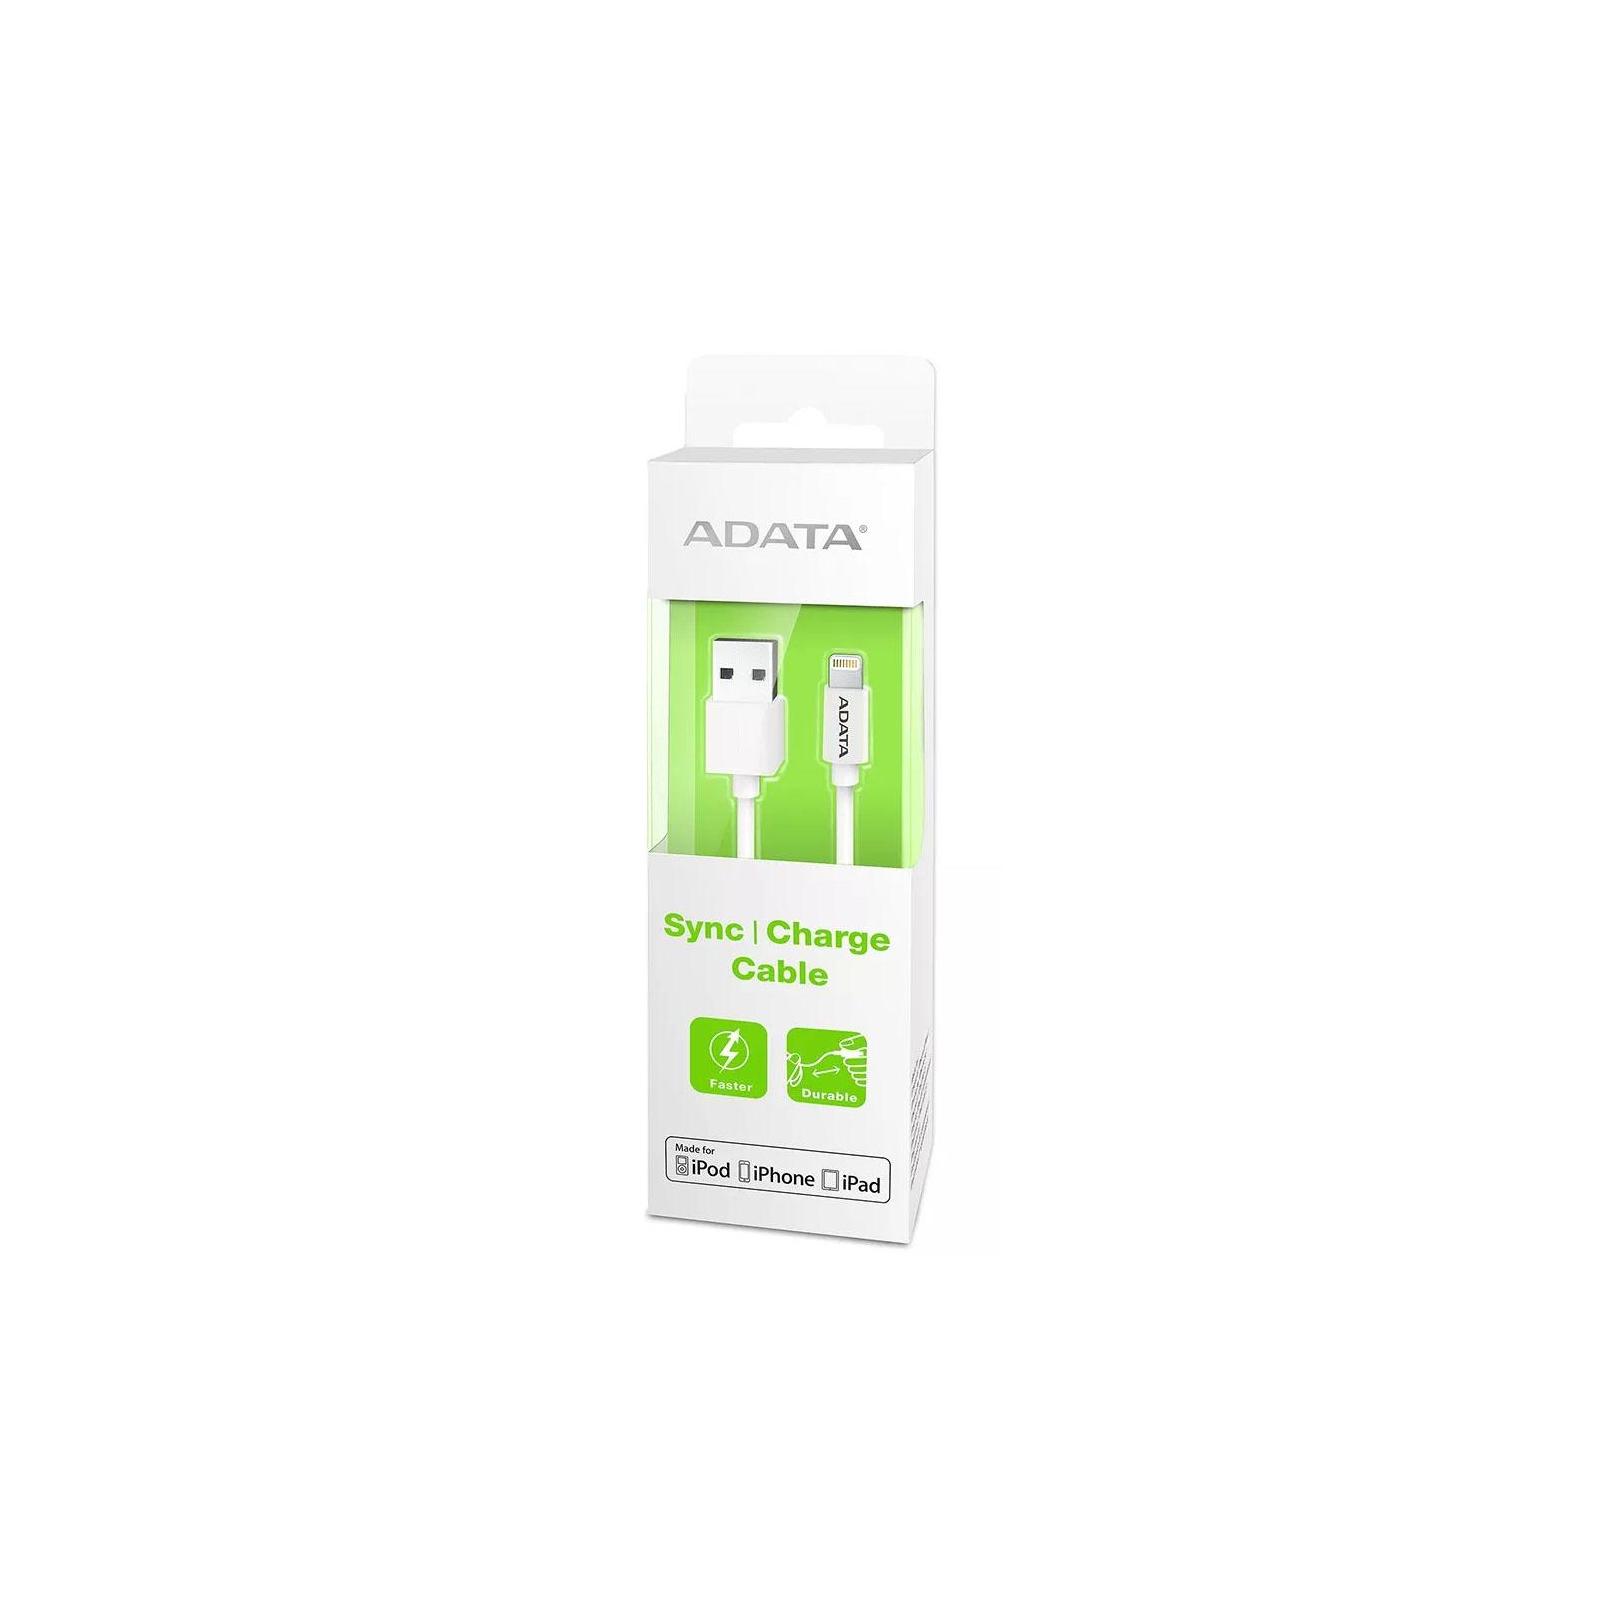 Дата кабель USB 2.0 AM to Lightning 1.0m MFI White ADATA (AMFIPL-100CM-CWH) изображение 3